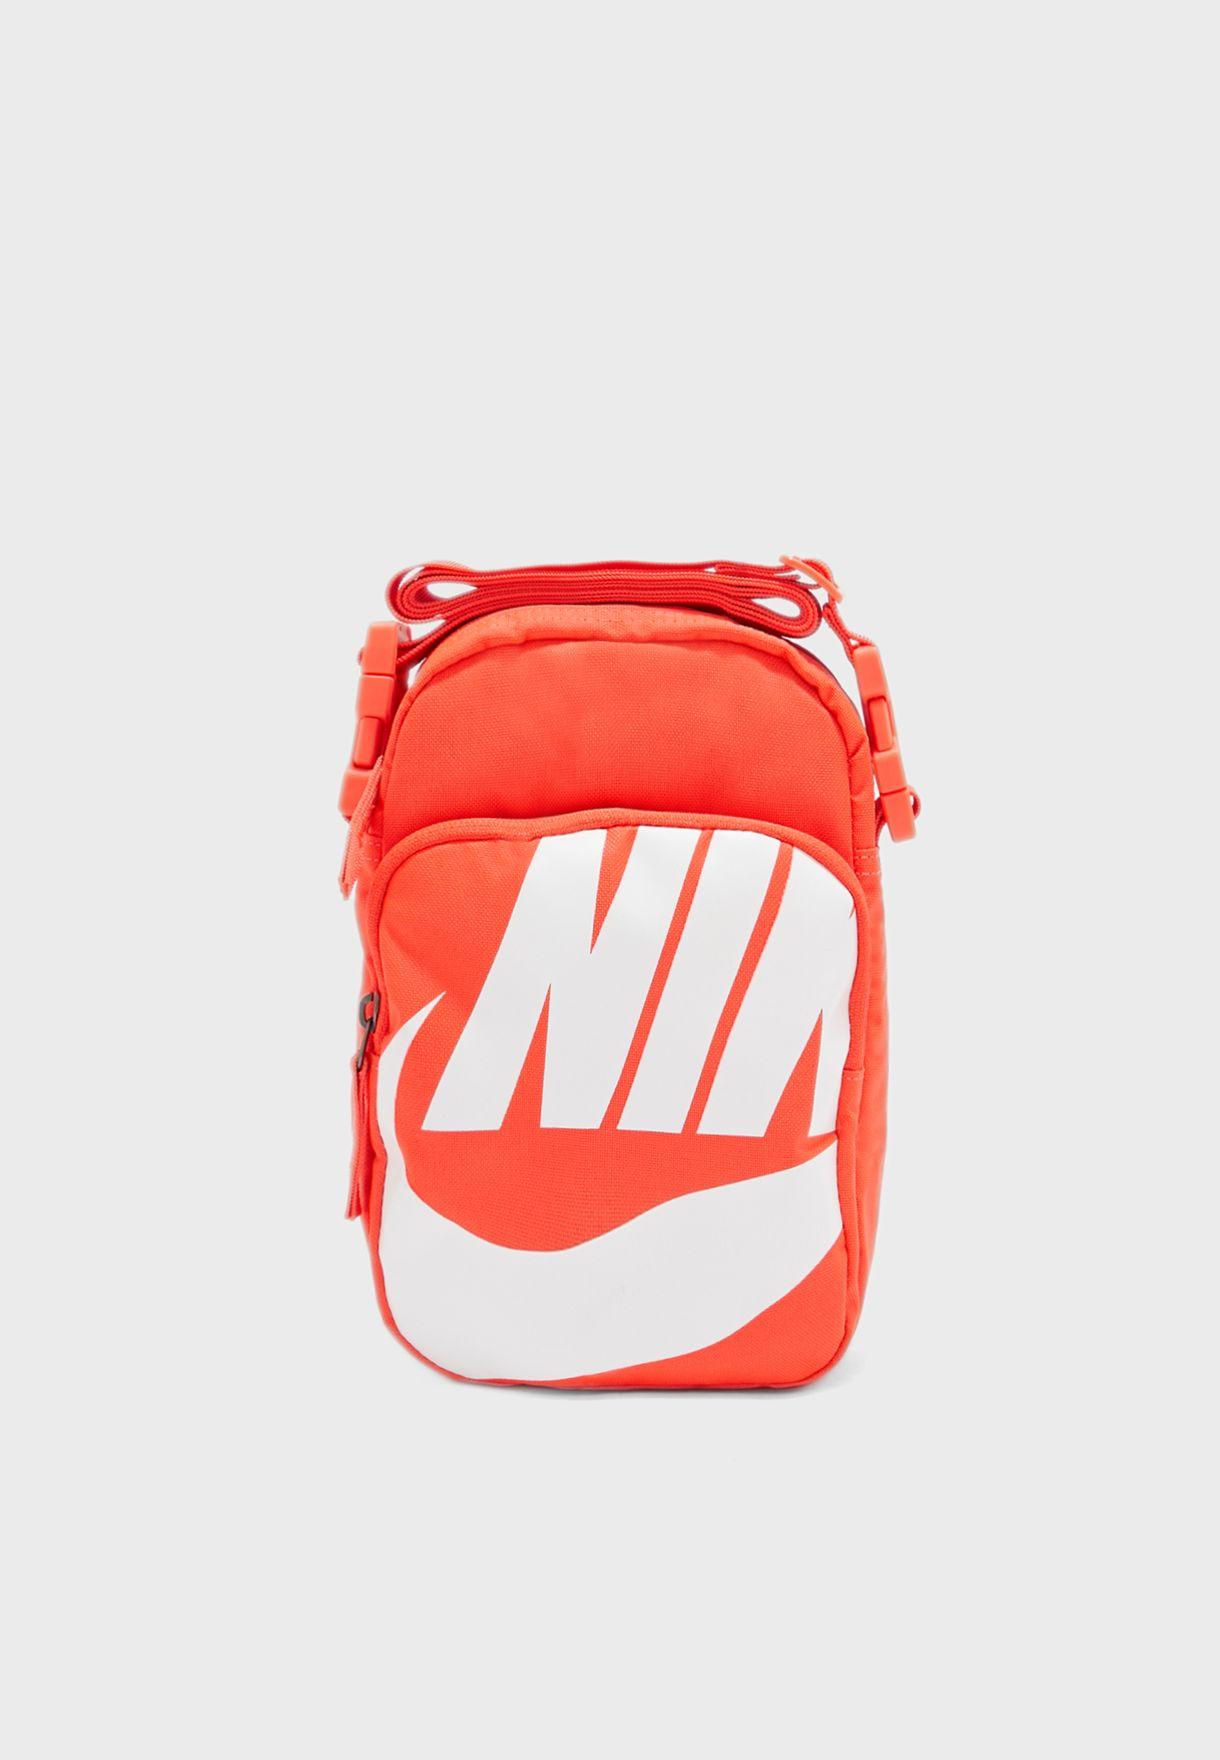 Pino exceso atlántico  Shop Nike orange Heritage Graphic 2.0 Crossbody Bag BA6344-671 for ...